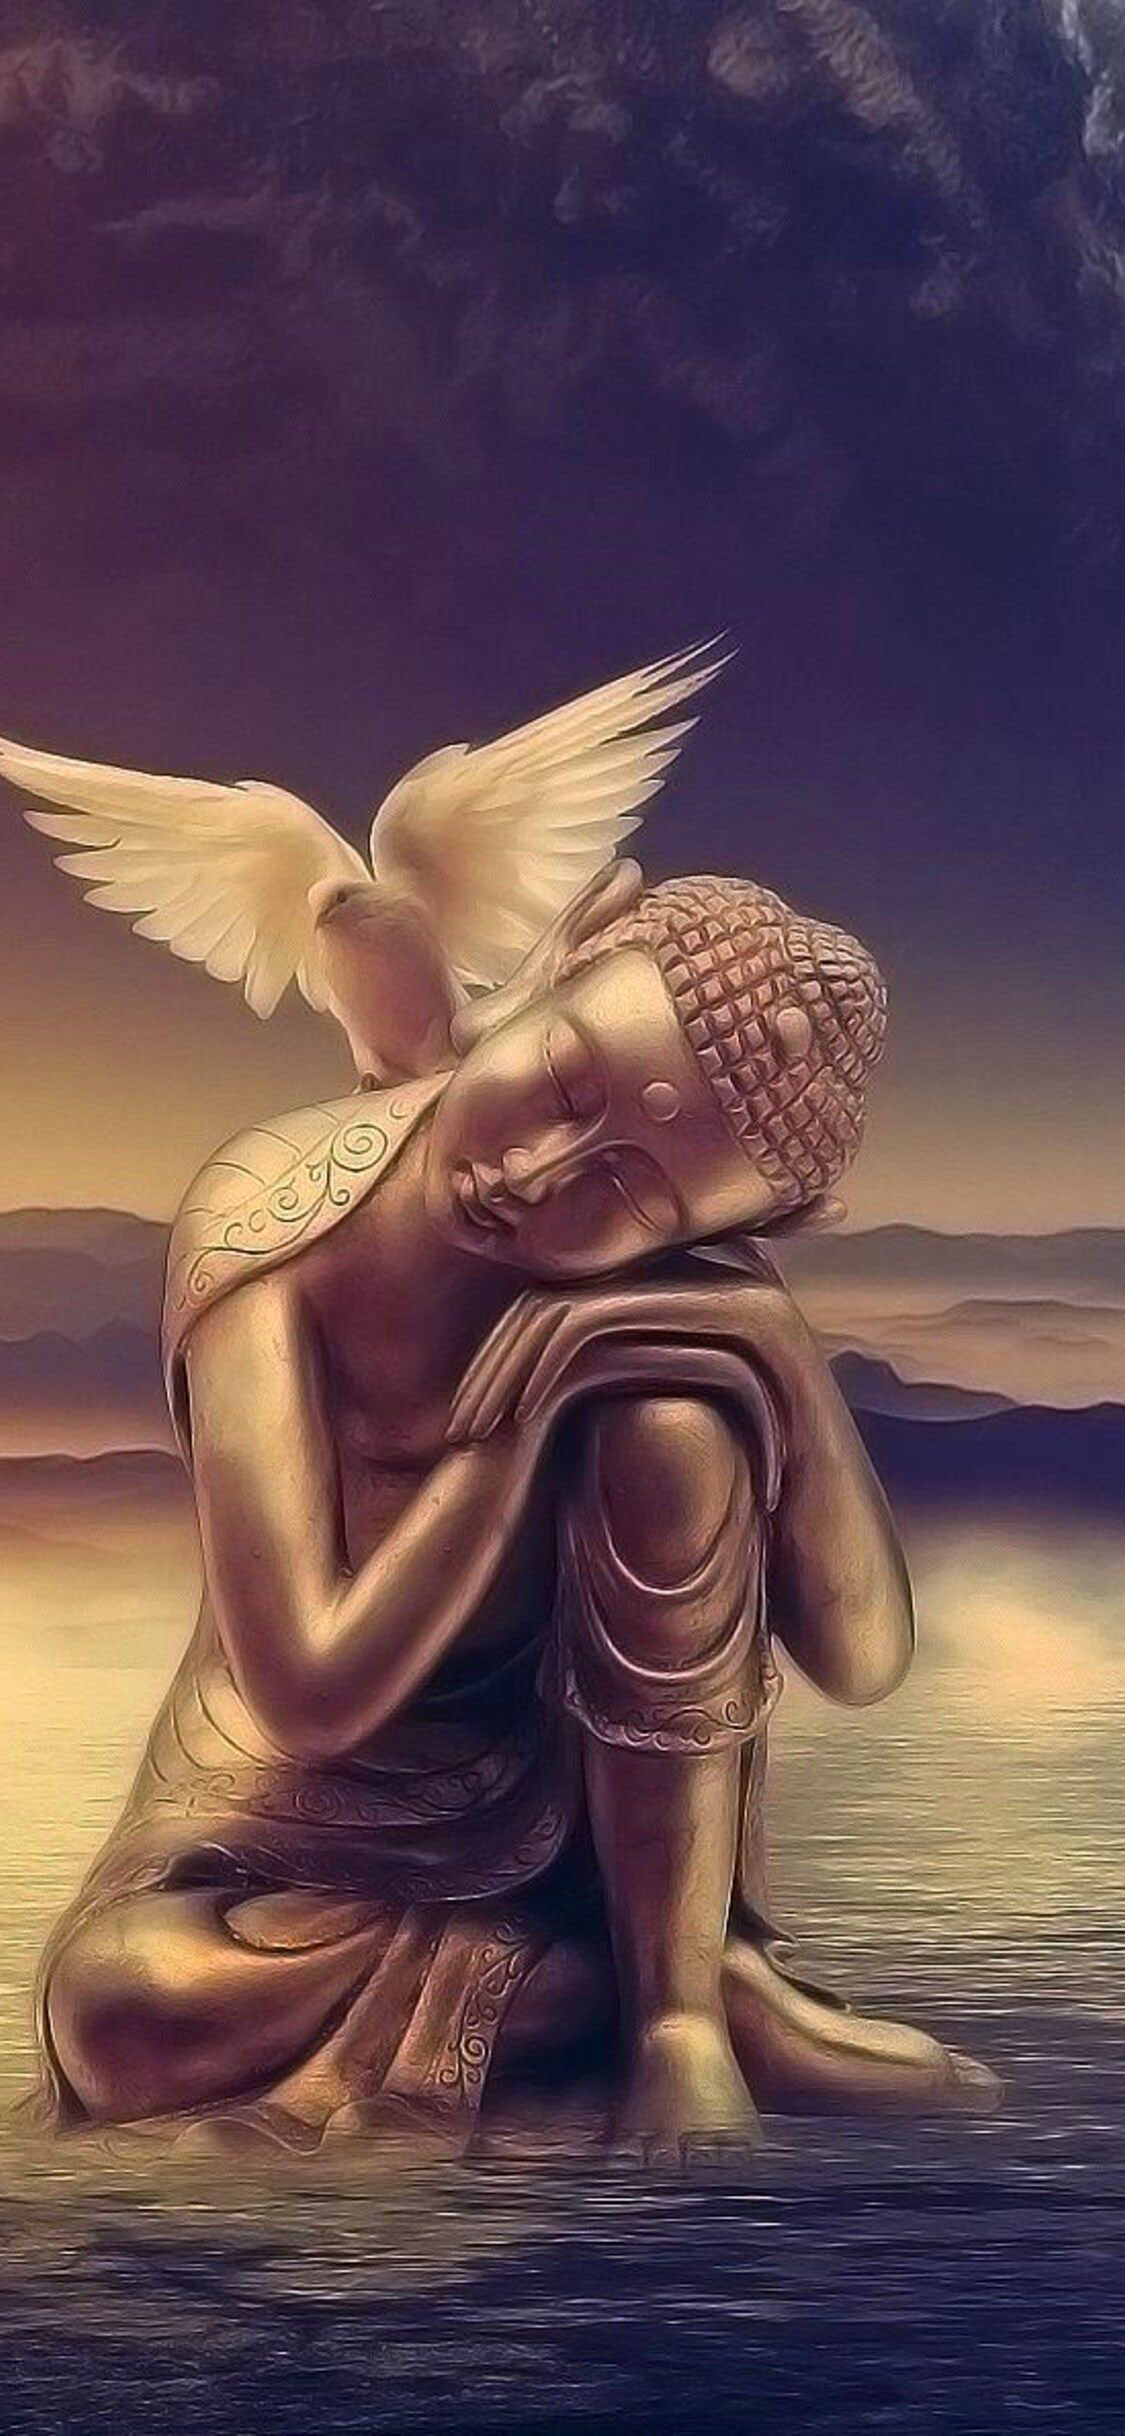 budhda Peaceful Whatsapp Dp Images